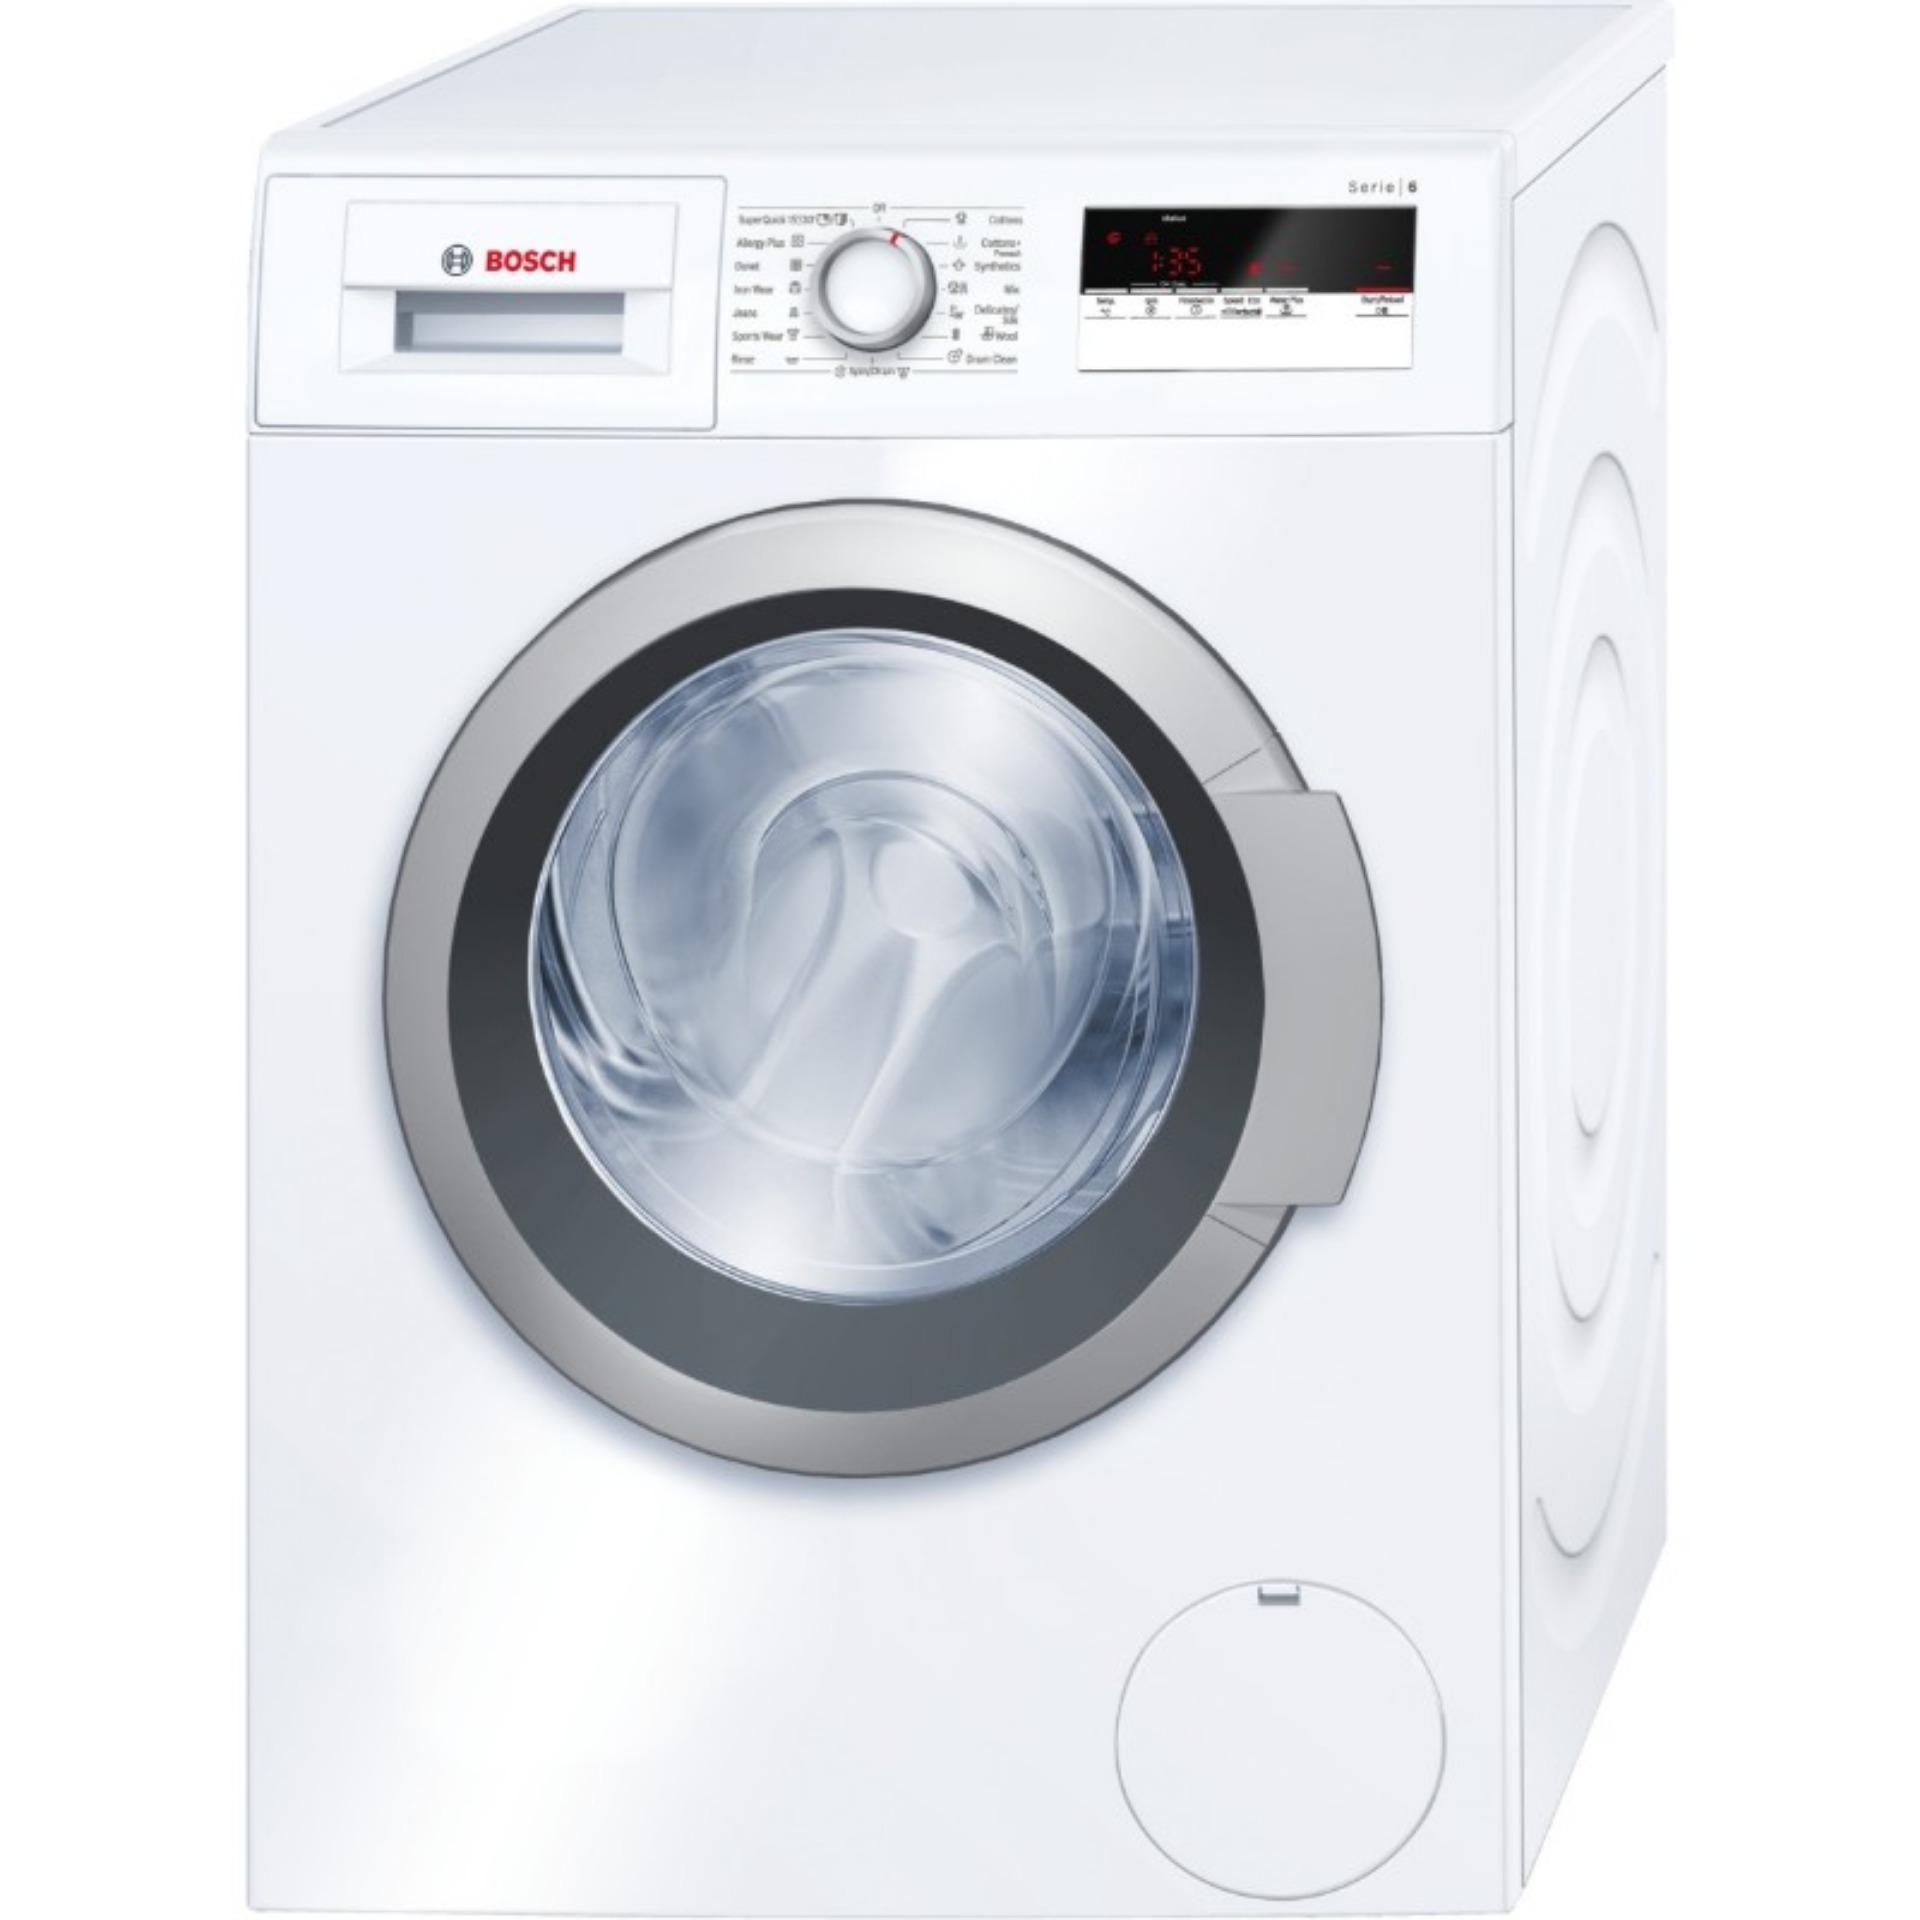 Latest Bosch Washing Machine Products Enjoy Huge Discounts